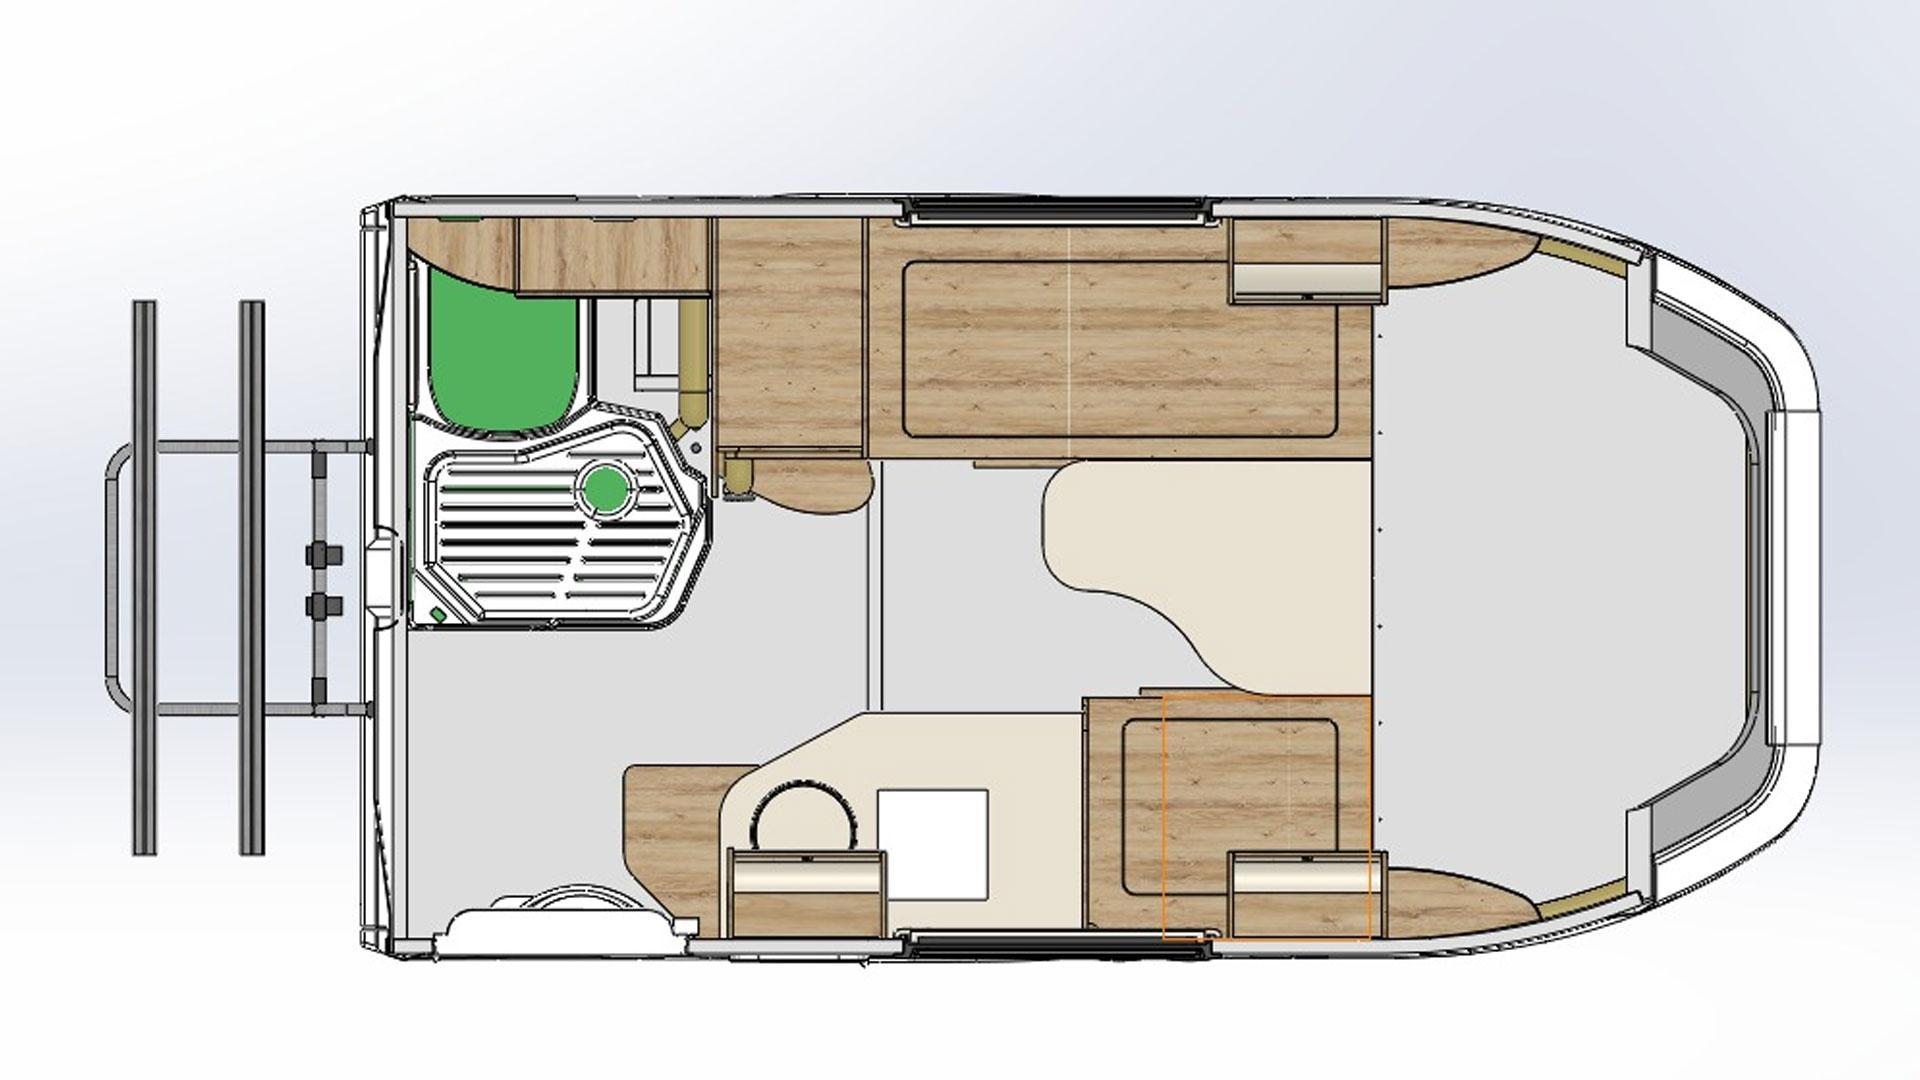 Lada Granta Camper plattegrond